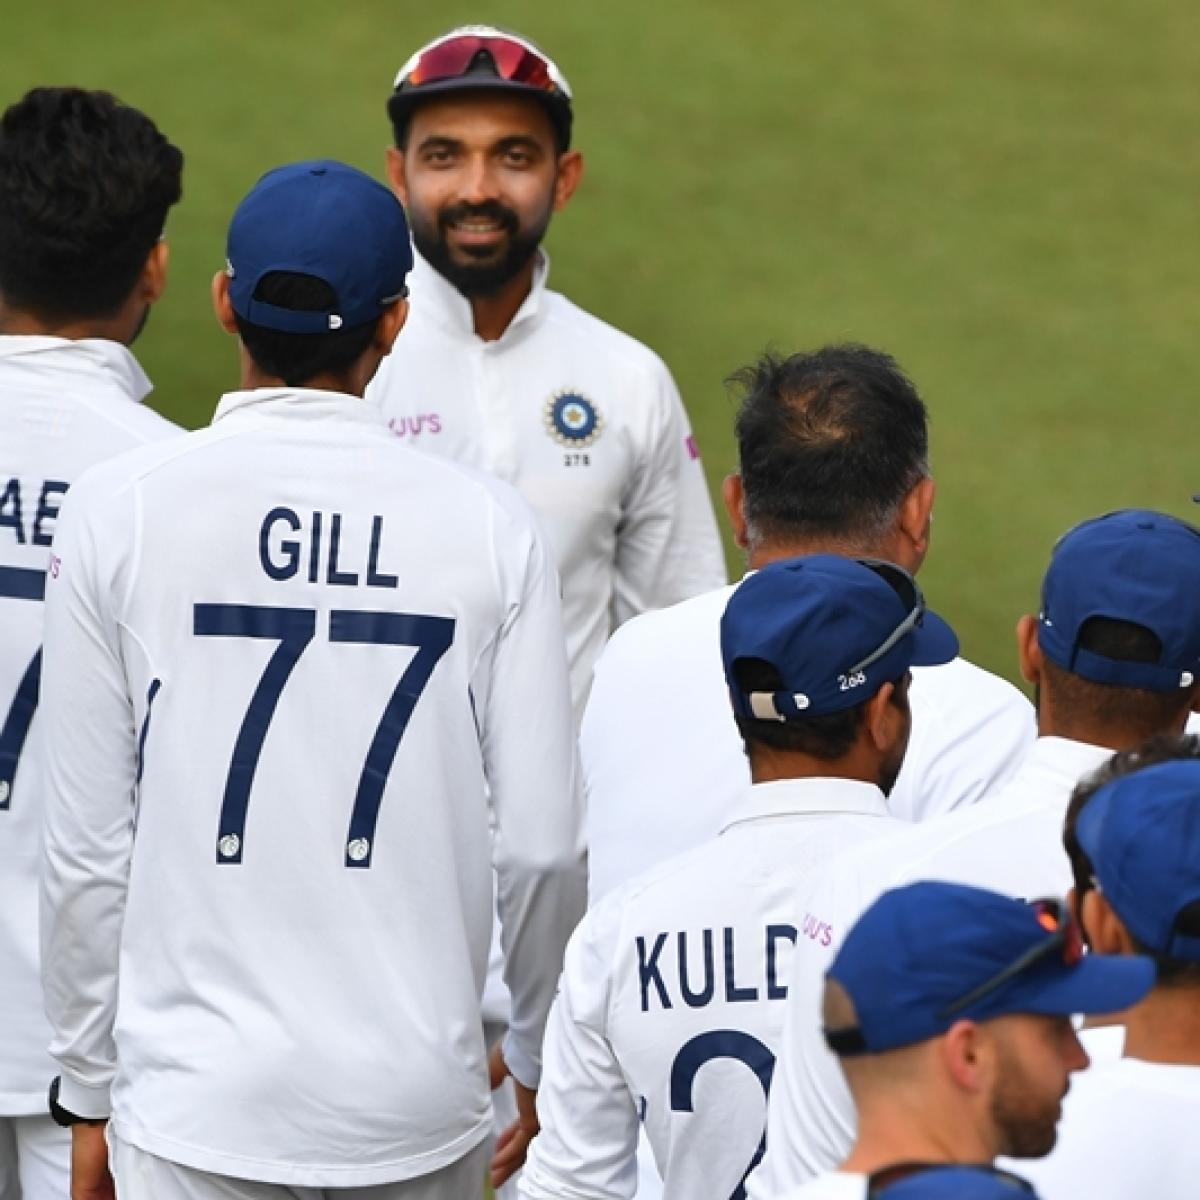 5 Indians in ICC top 11 test list